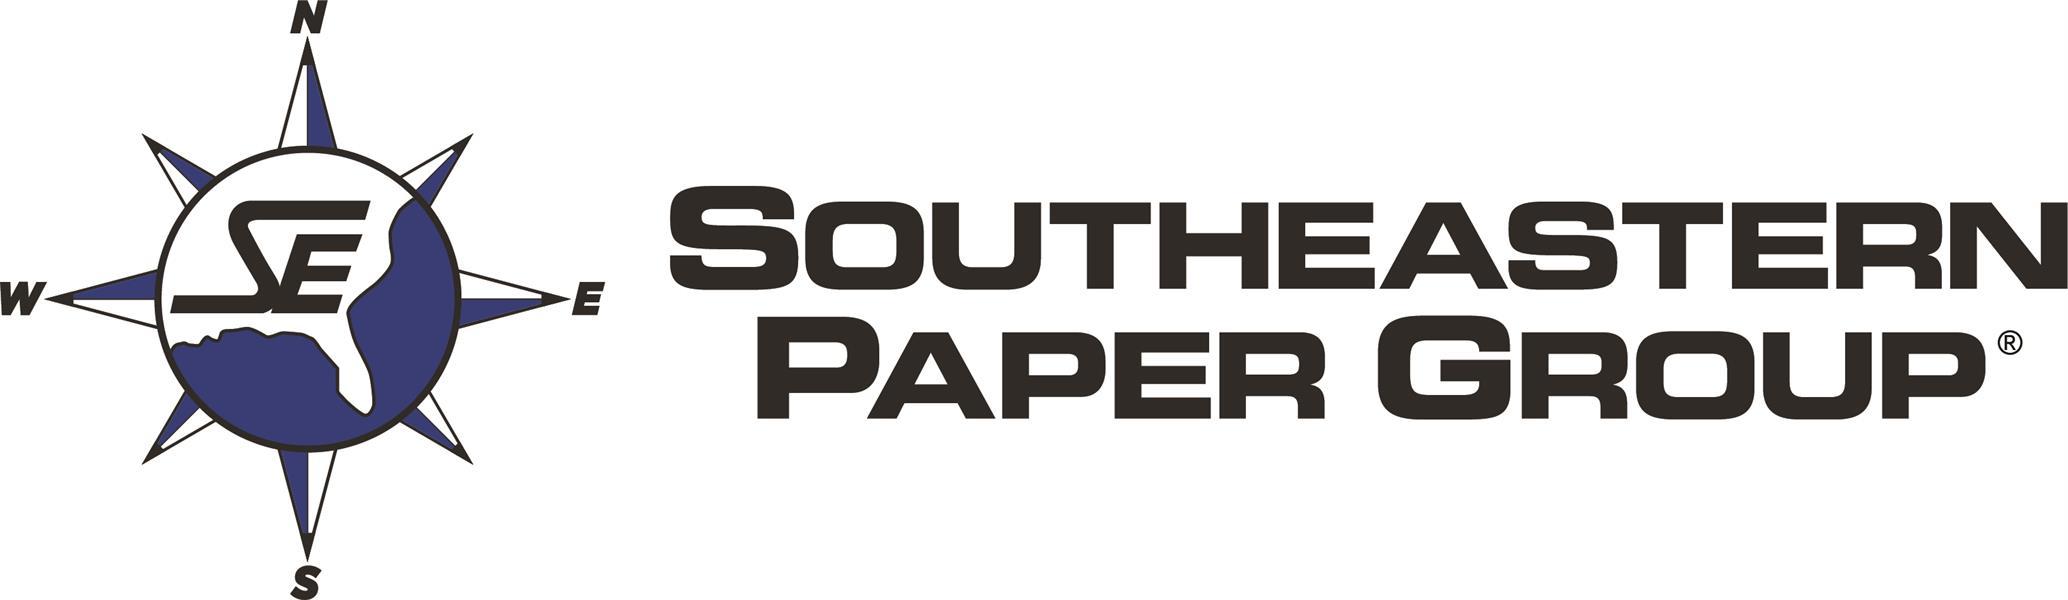 southeastern paper group linkedin